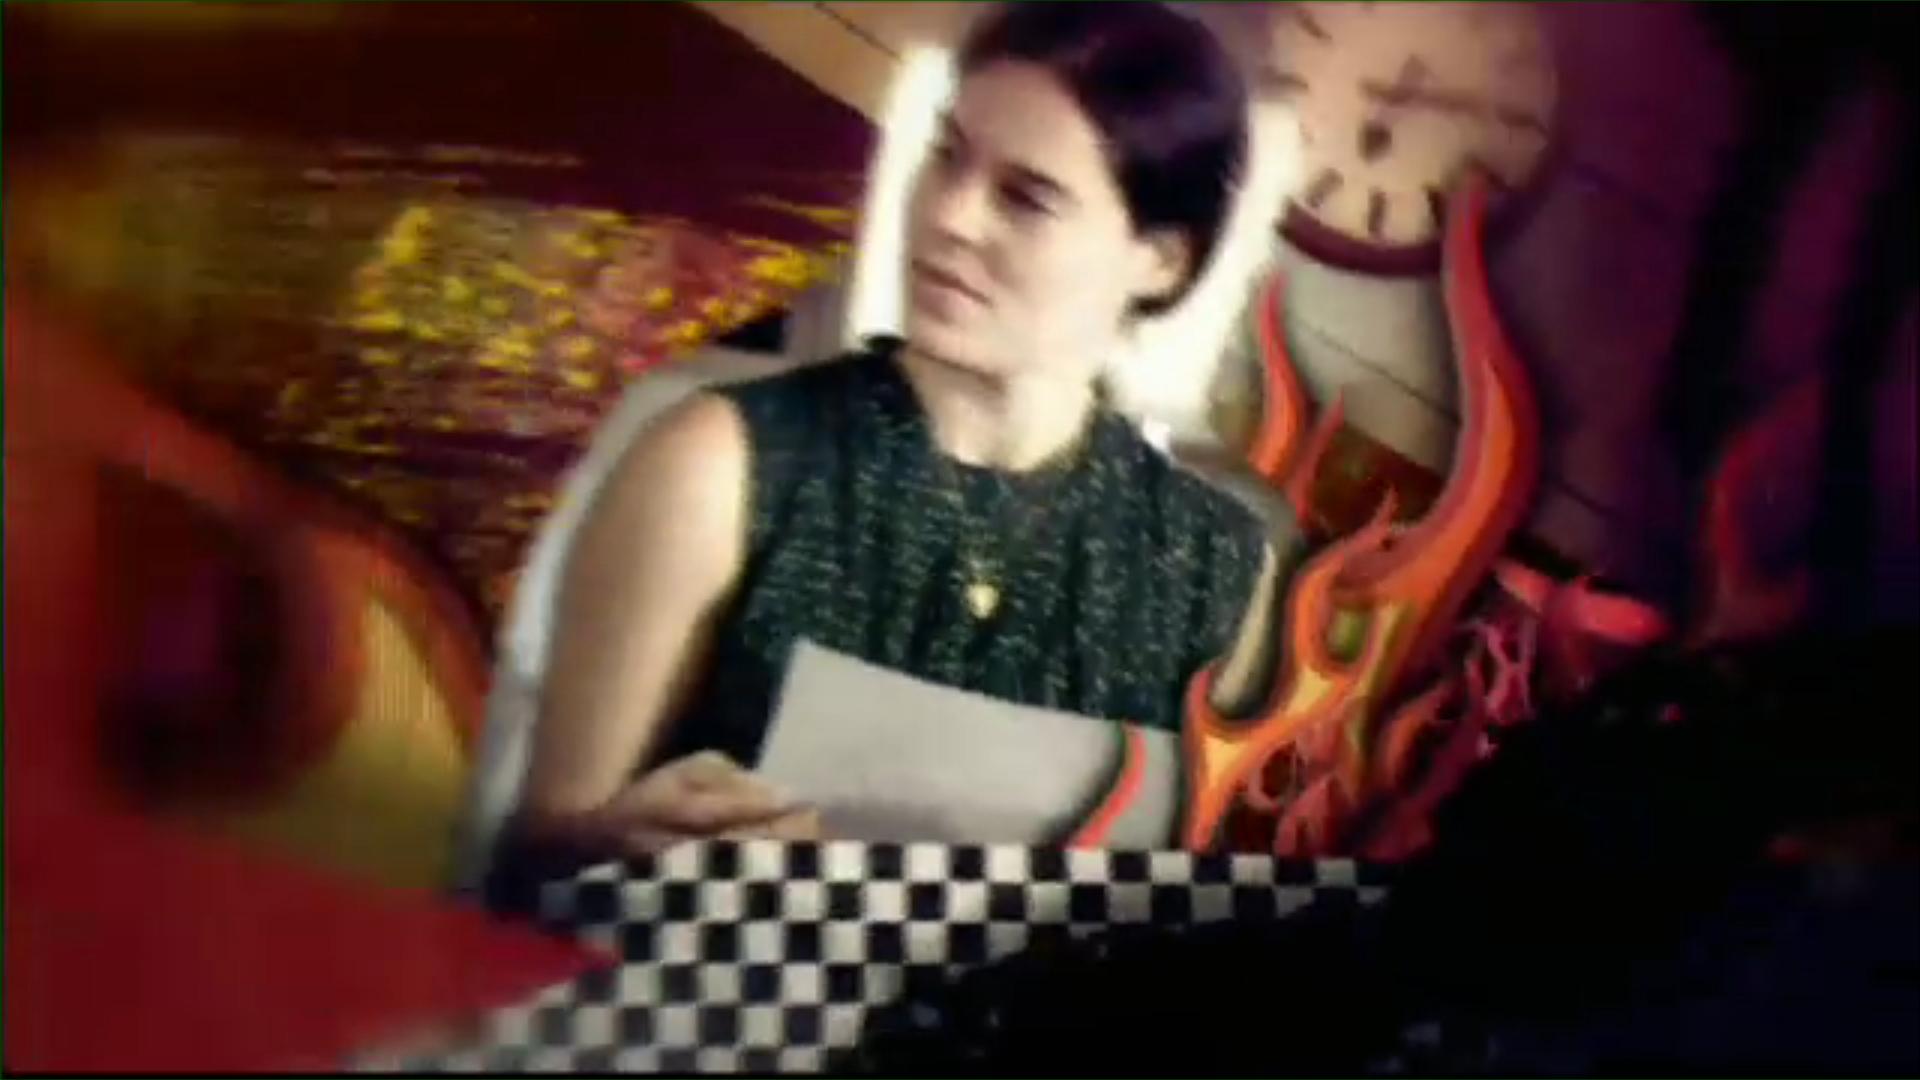 dk_rollergirls_5597-PRORES_LABREEL.mov__3_00636_o.jpg